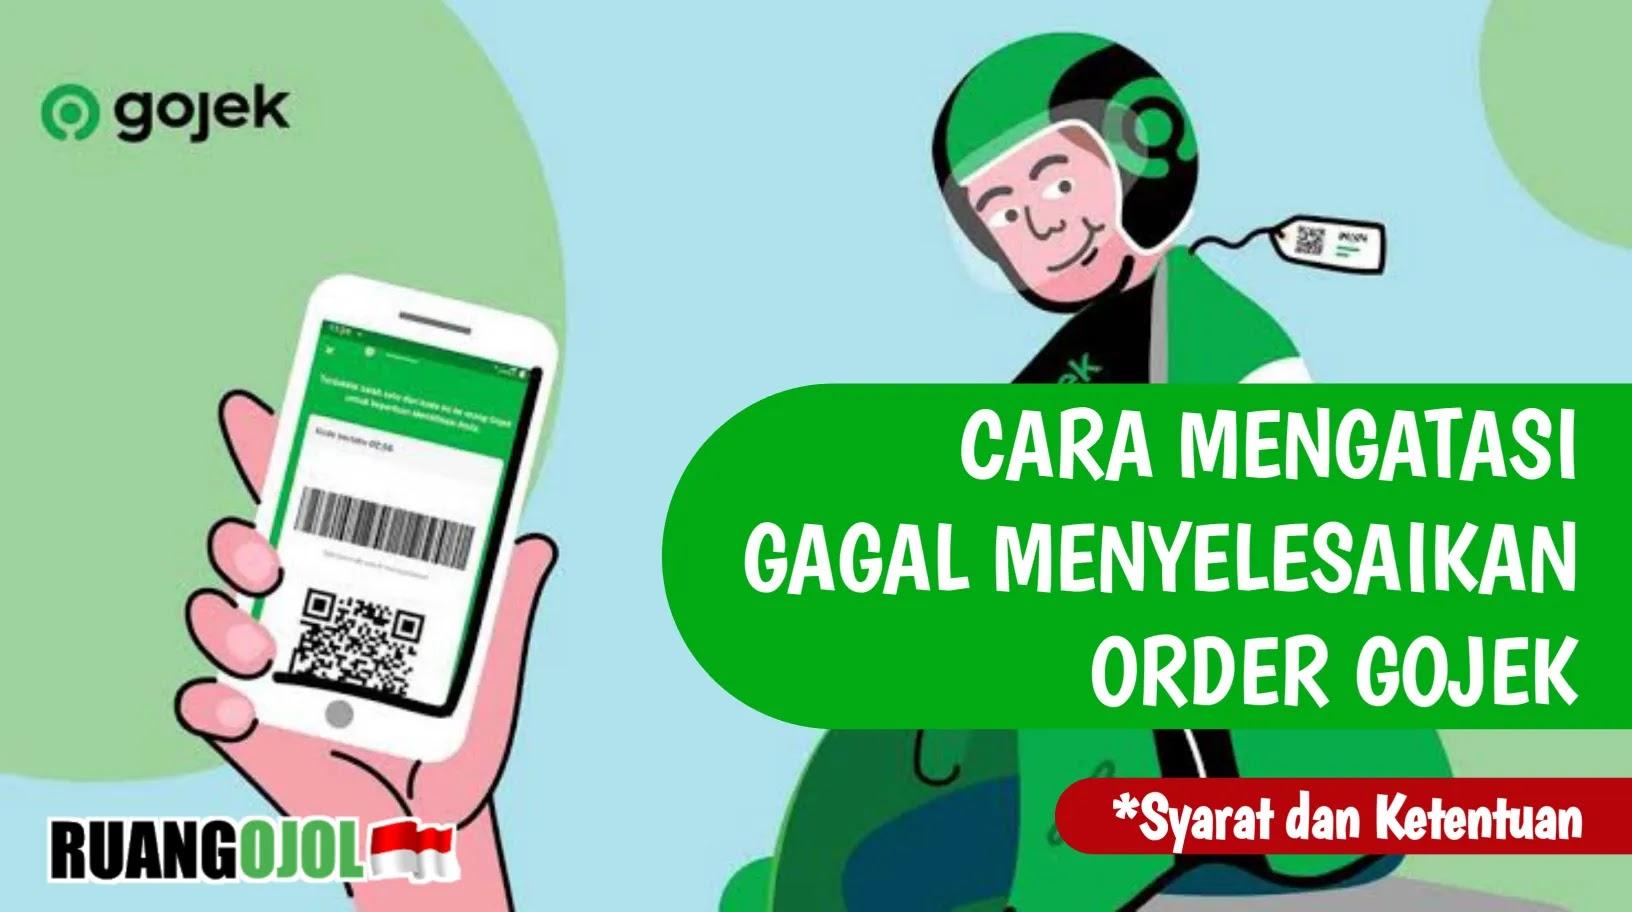 Cara Mudah Mengatasi Tidak Dapat Menyelesaikan Order Gojek